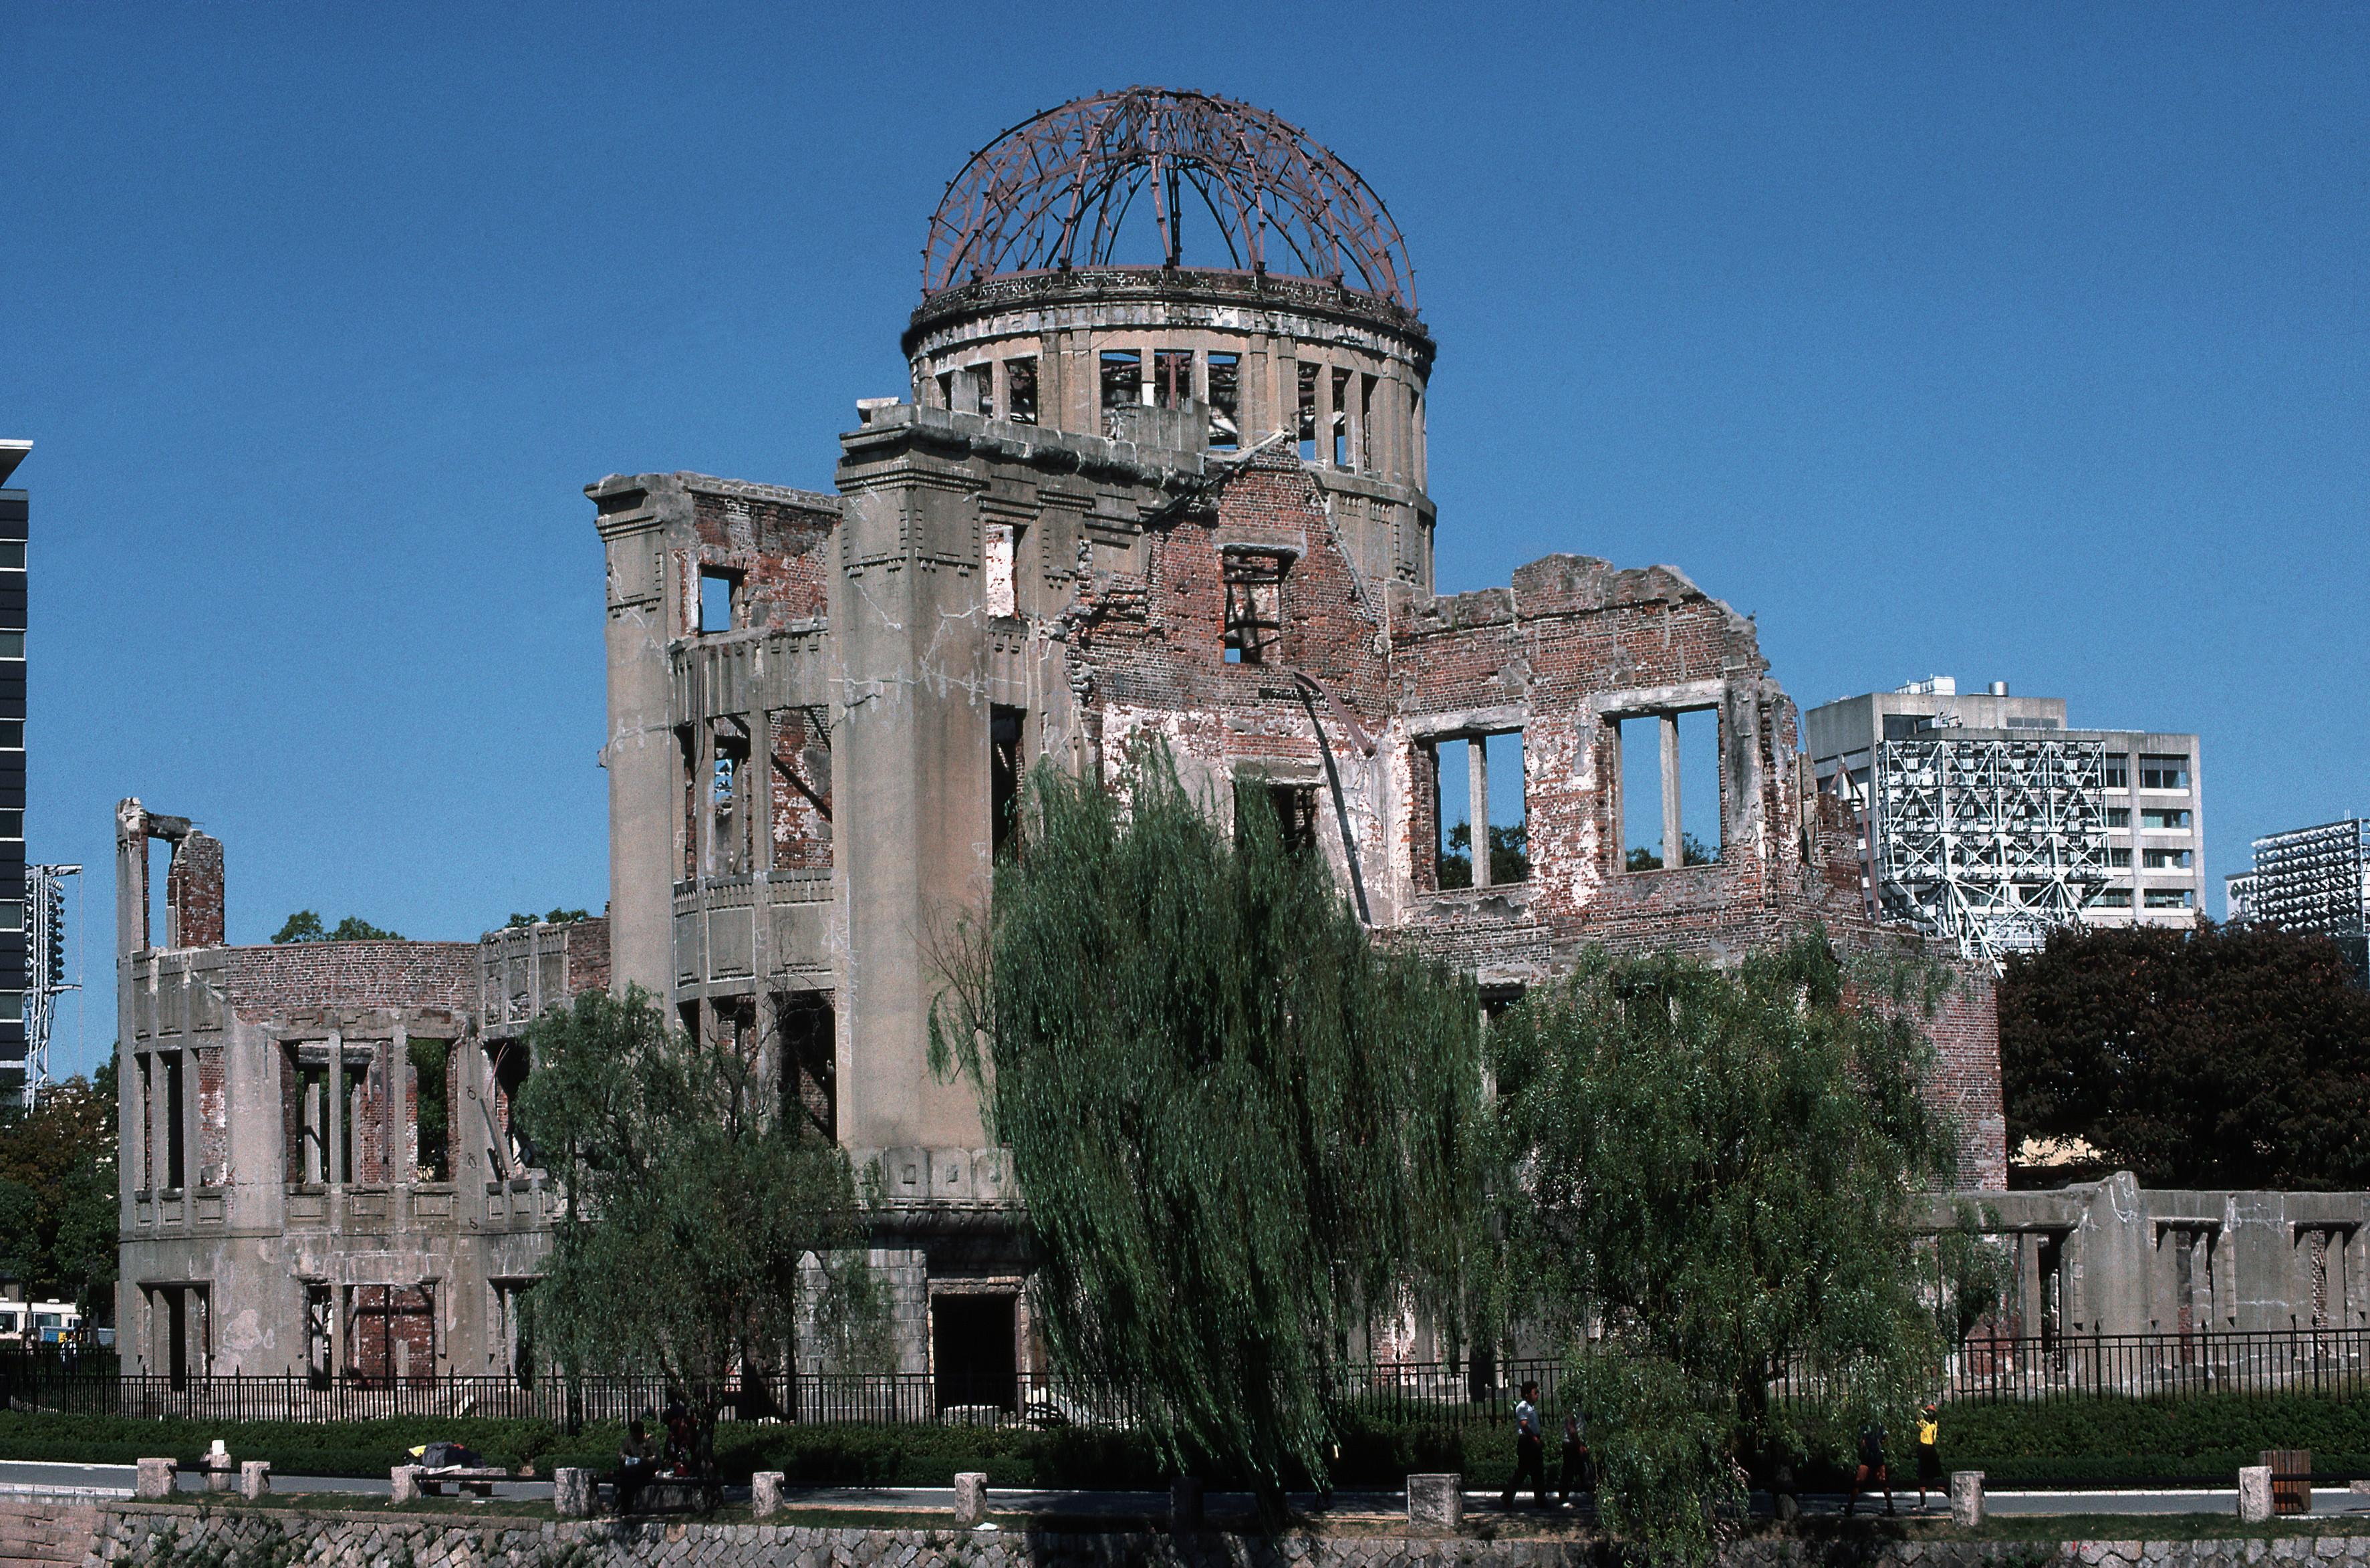 hiroshima-aftermath - Hiroshima and Nagasaki Pictures - World War II - HISTORY.com